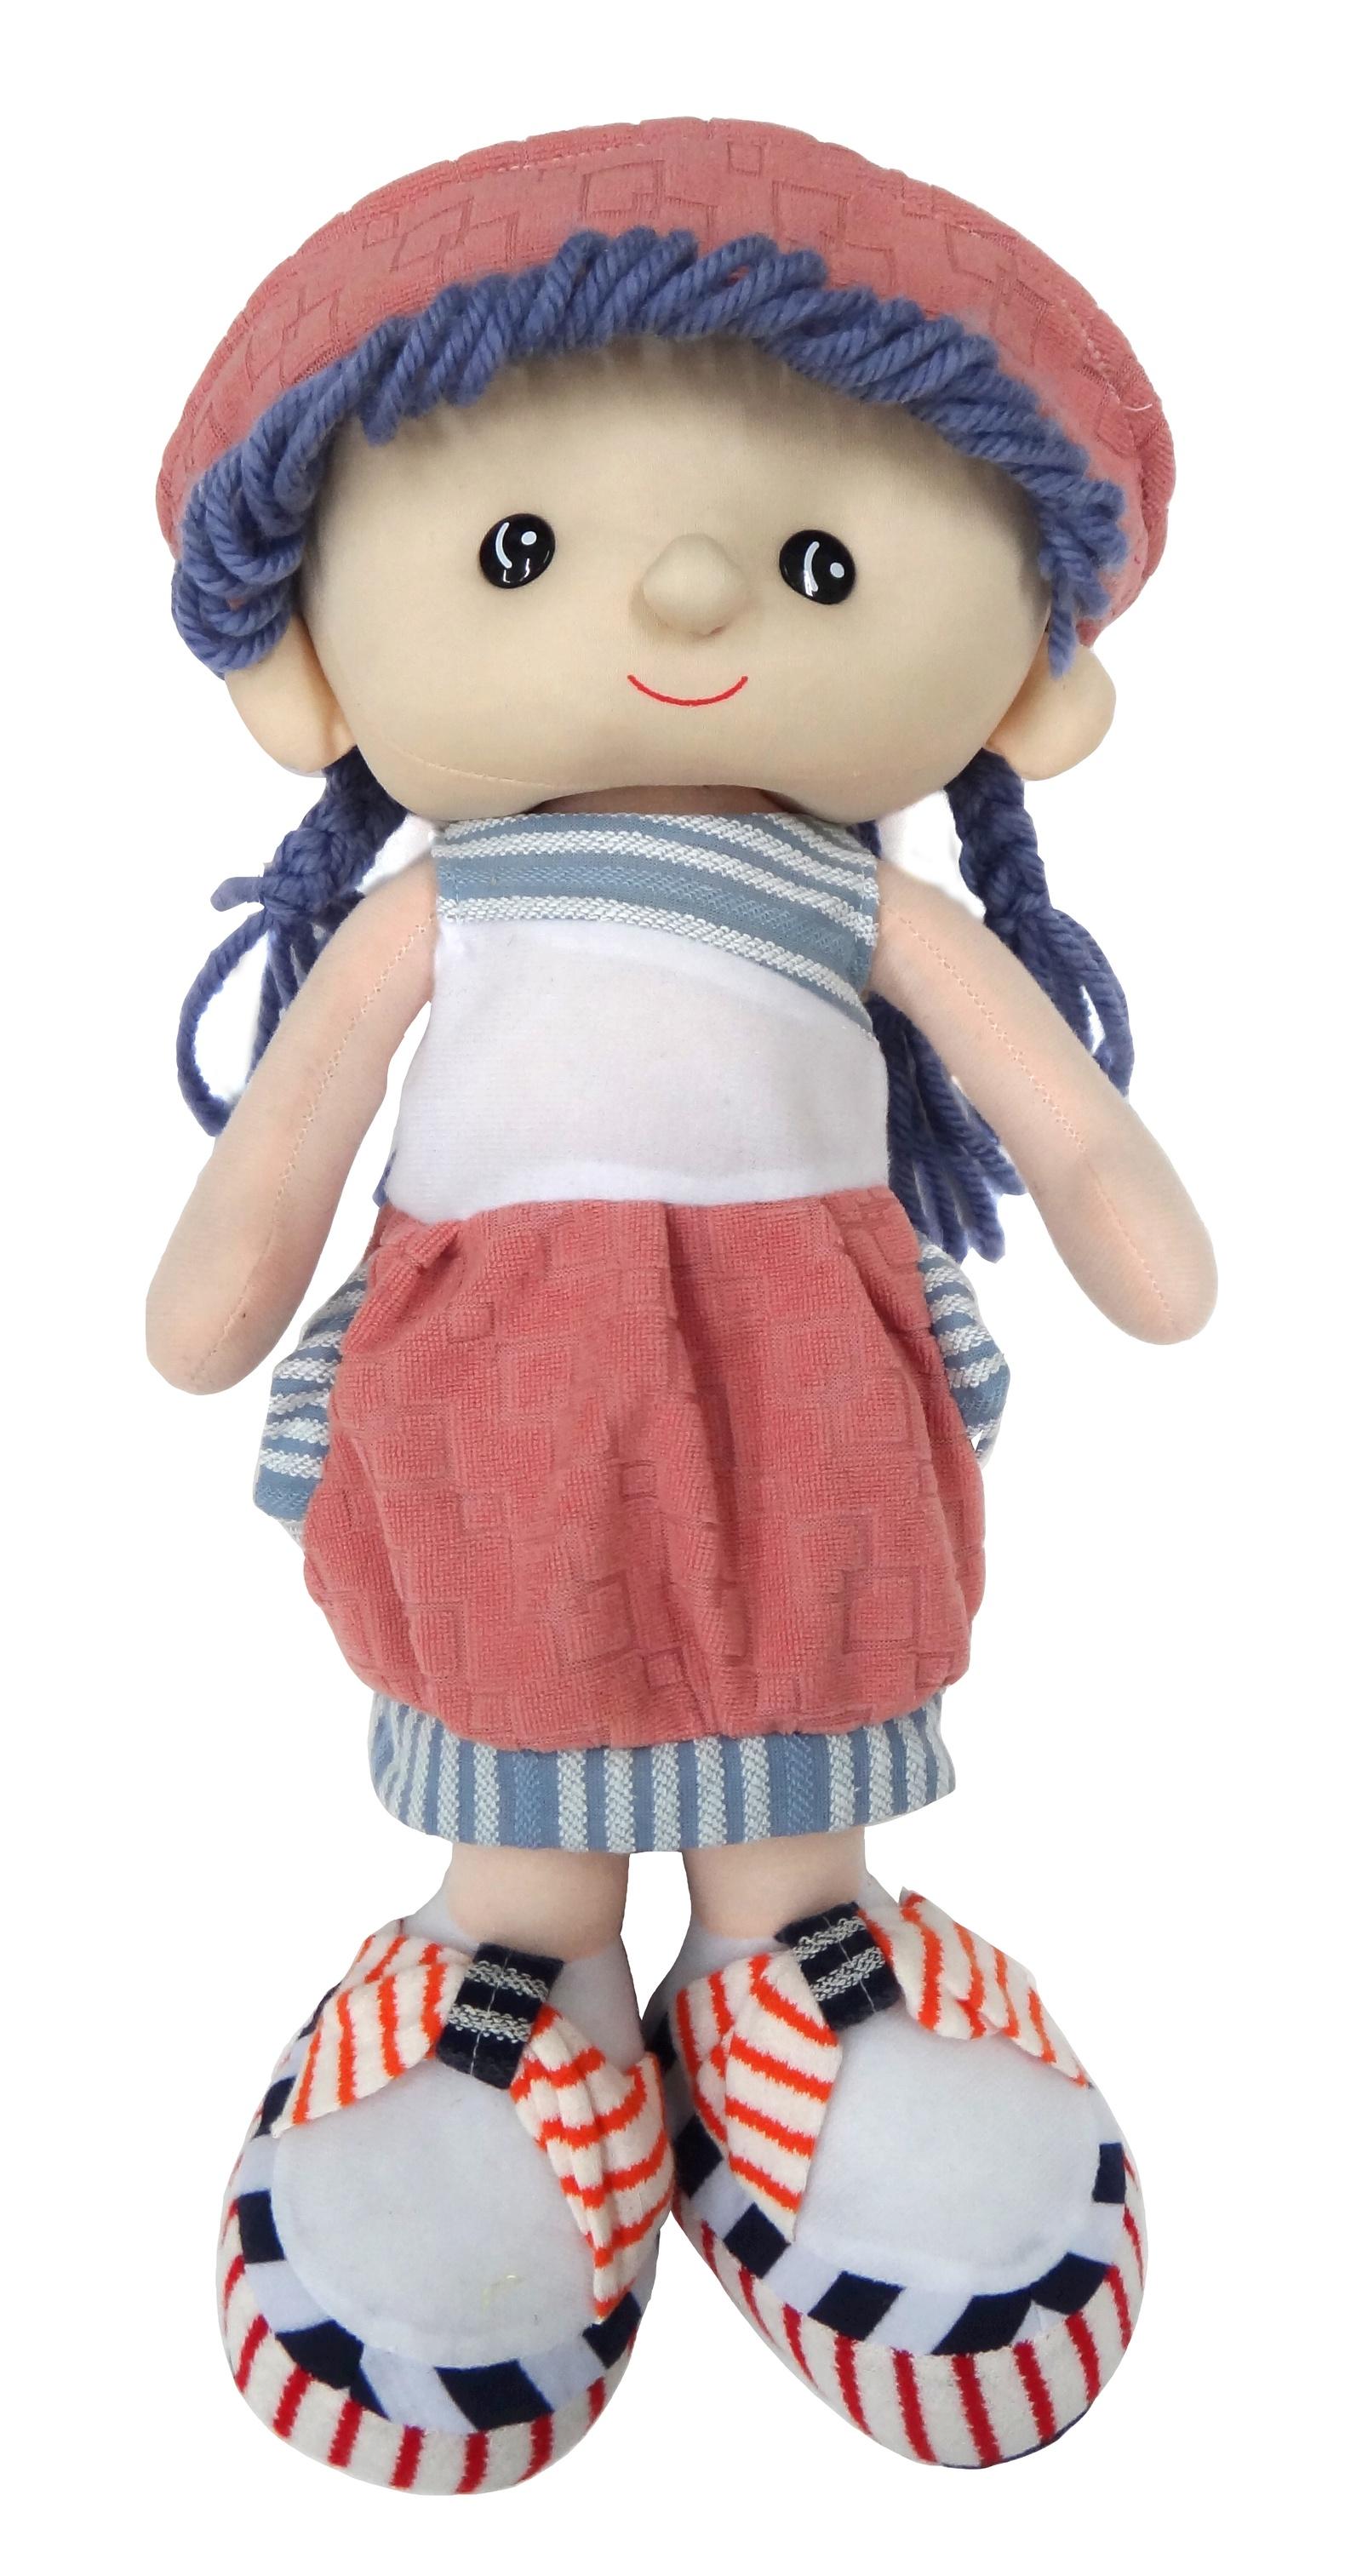 Мягкая кукла Правила Успеха Модель «Ксюша», 4610009215952